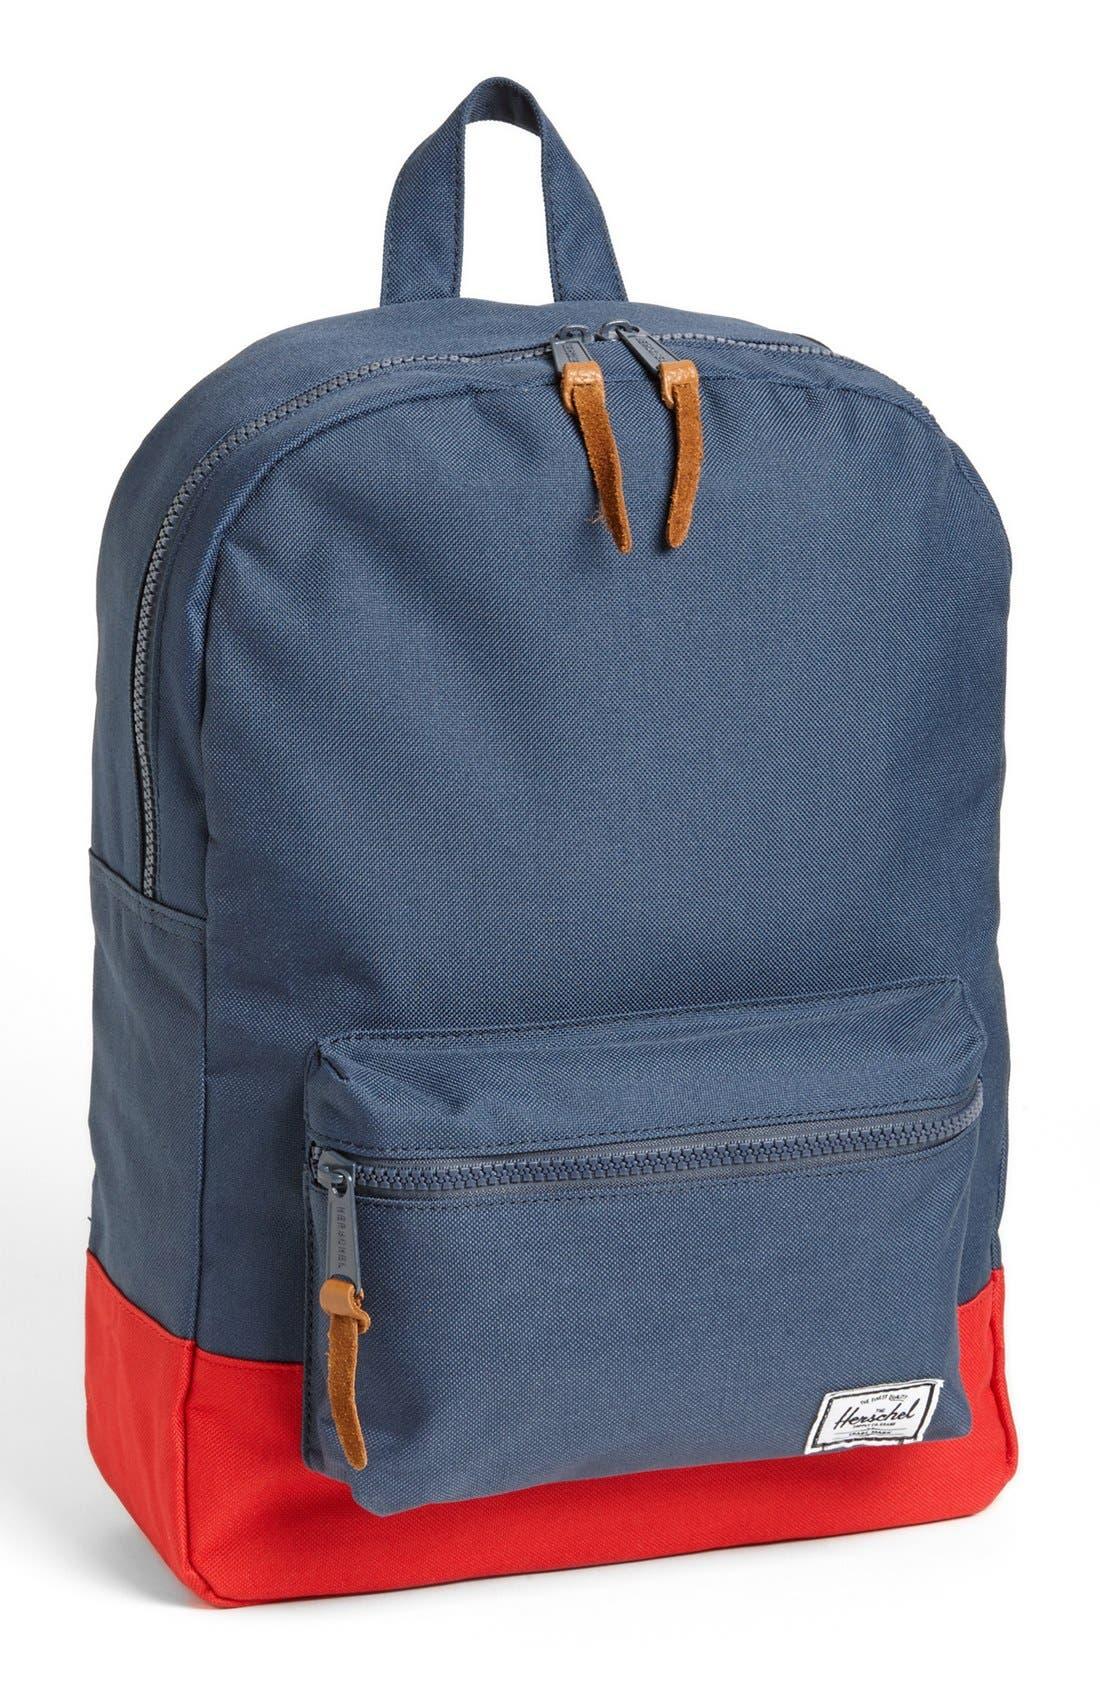 Main Image - Herschel Supply Co. 'Settlement' Backpack (Big Kid)